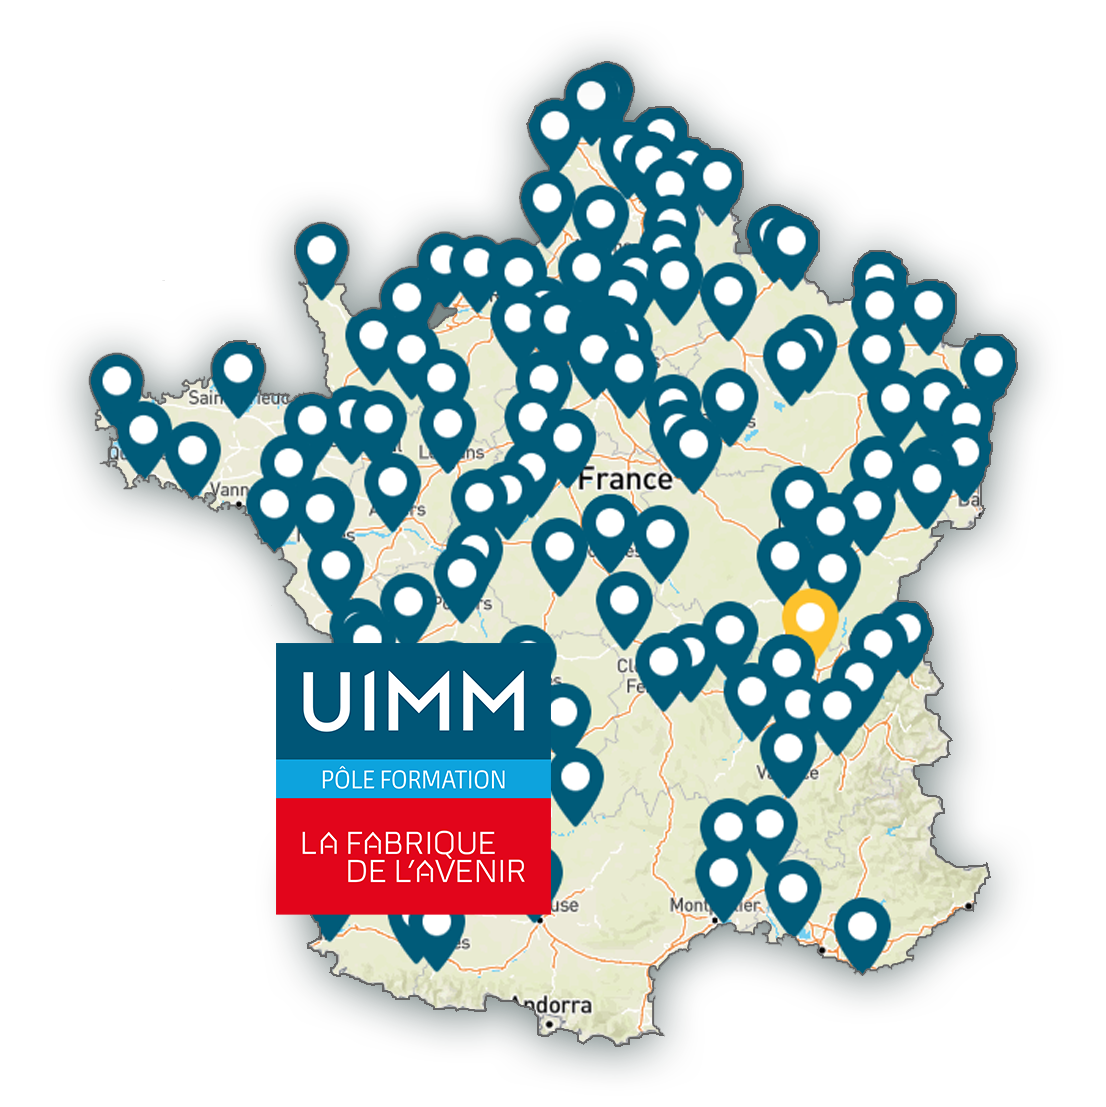 carte reseau pole formation UIMM